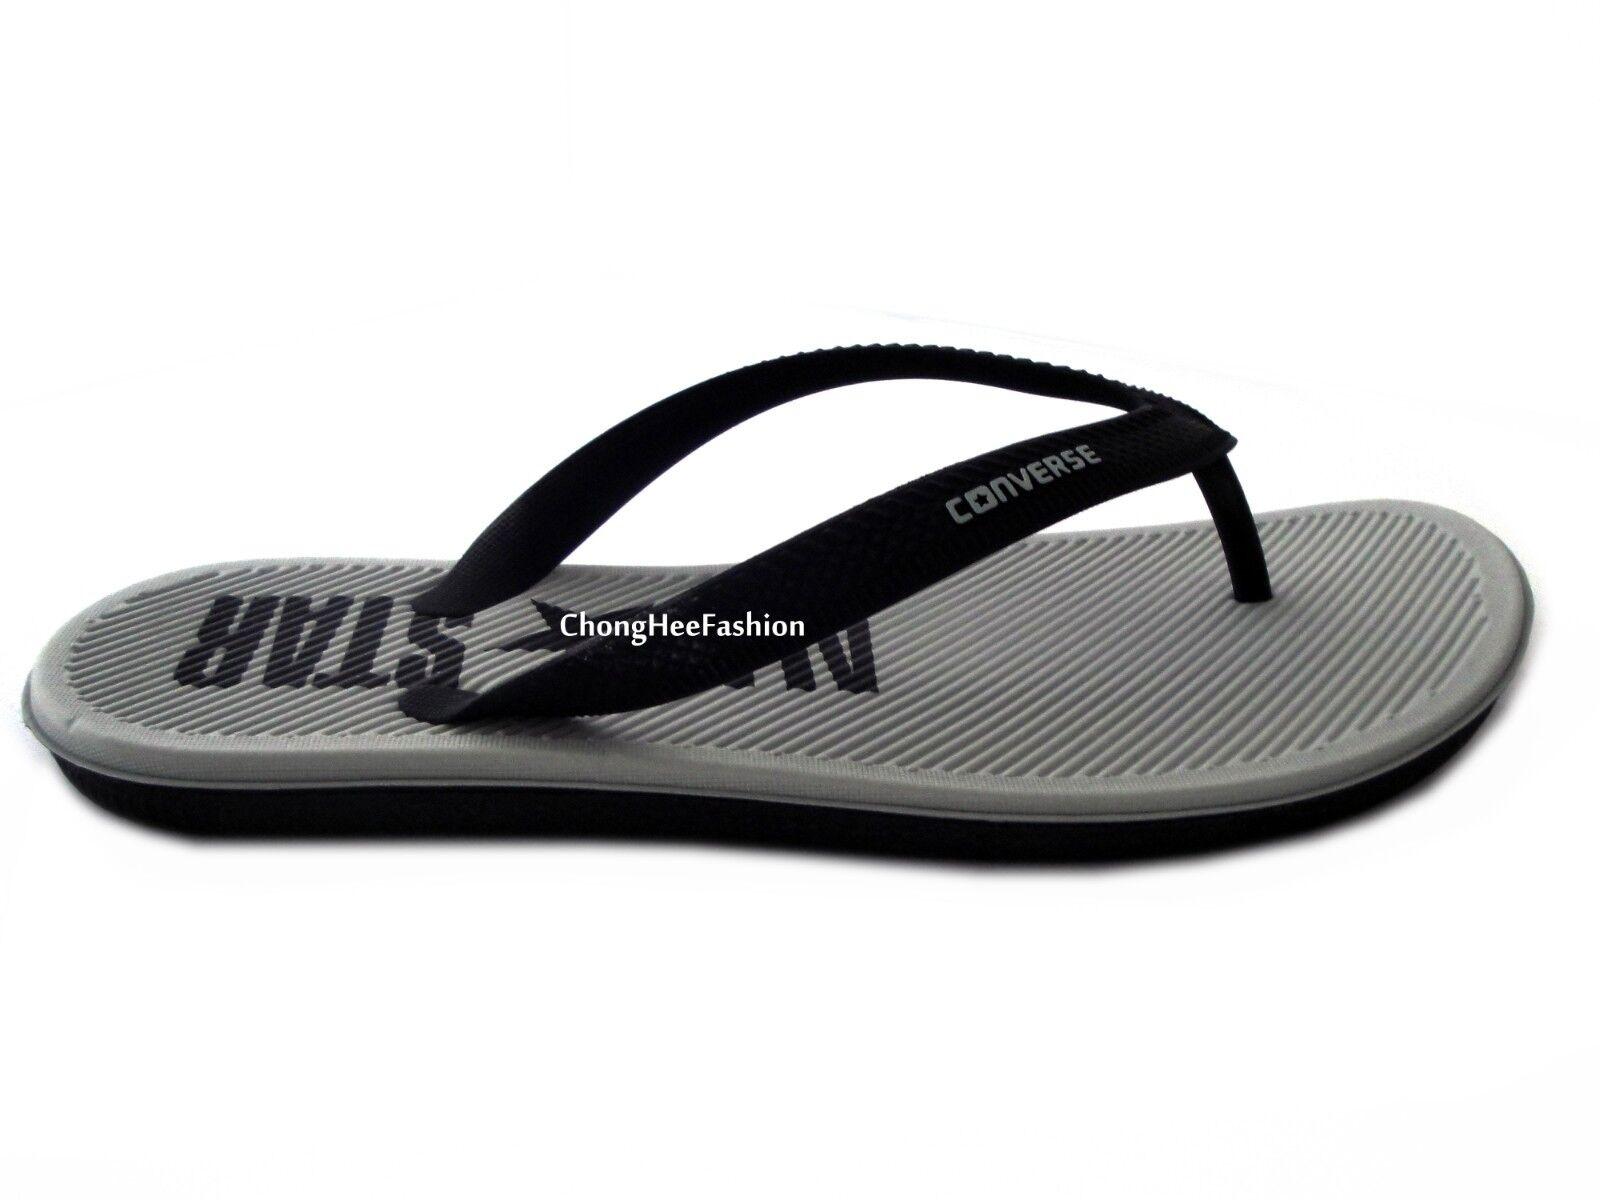 1ae6174c795cb9 ... Converse Sand Stap All All All Star Thong Flip Flops Unisex Sandals  Beach Summer Shoes 2f560b ...